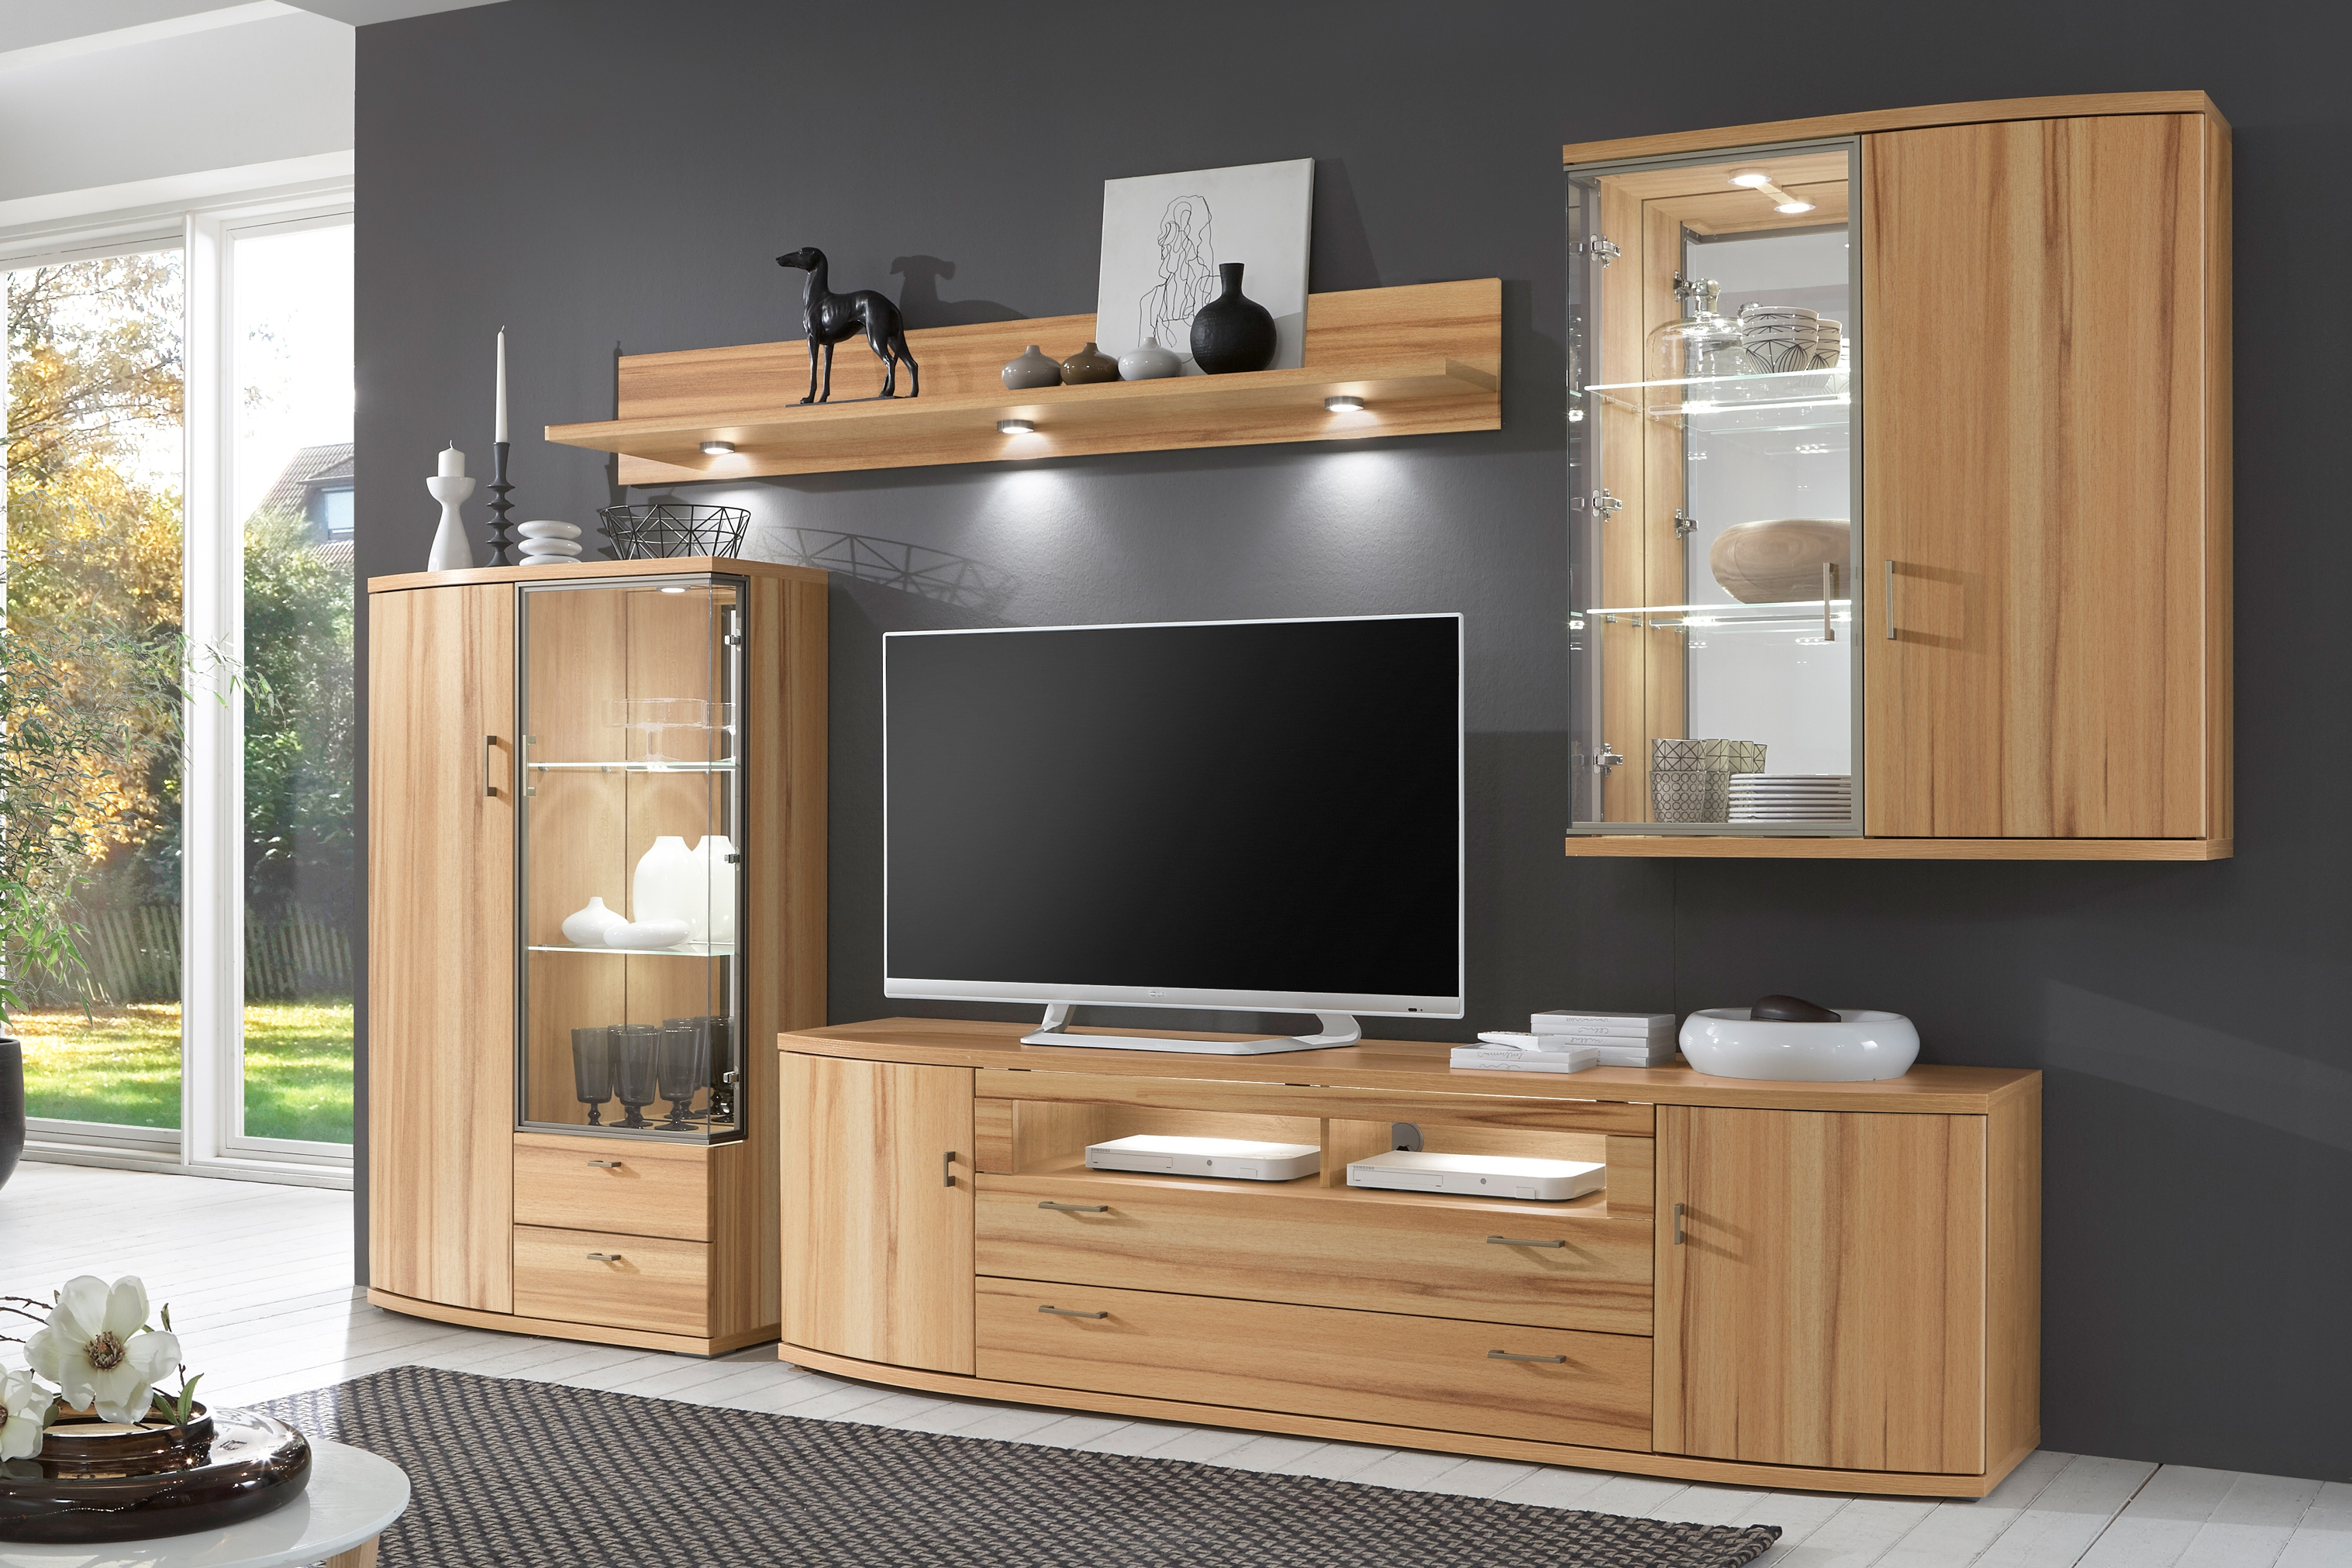 ideal m bel wohnwand riva 352 kernbuche m bel letz ihr online shop. Black Bedroom Furniture Sets. Home Design Ideas